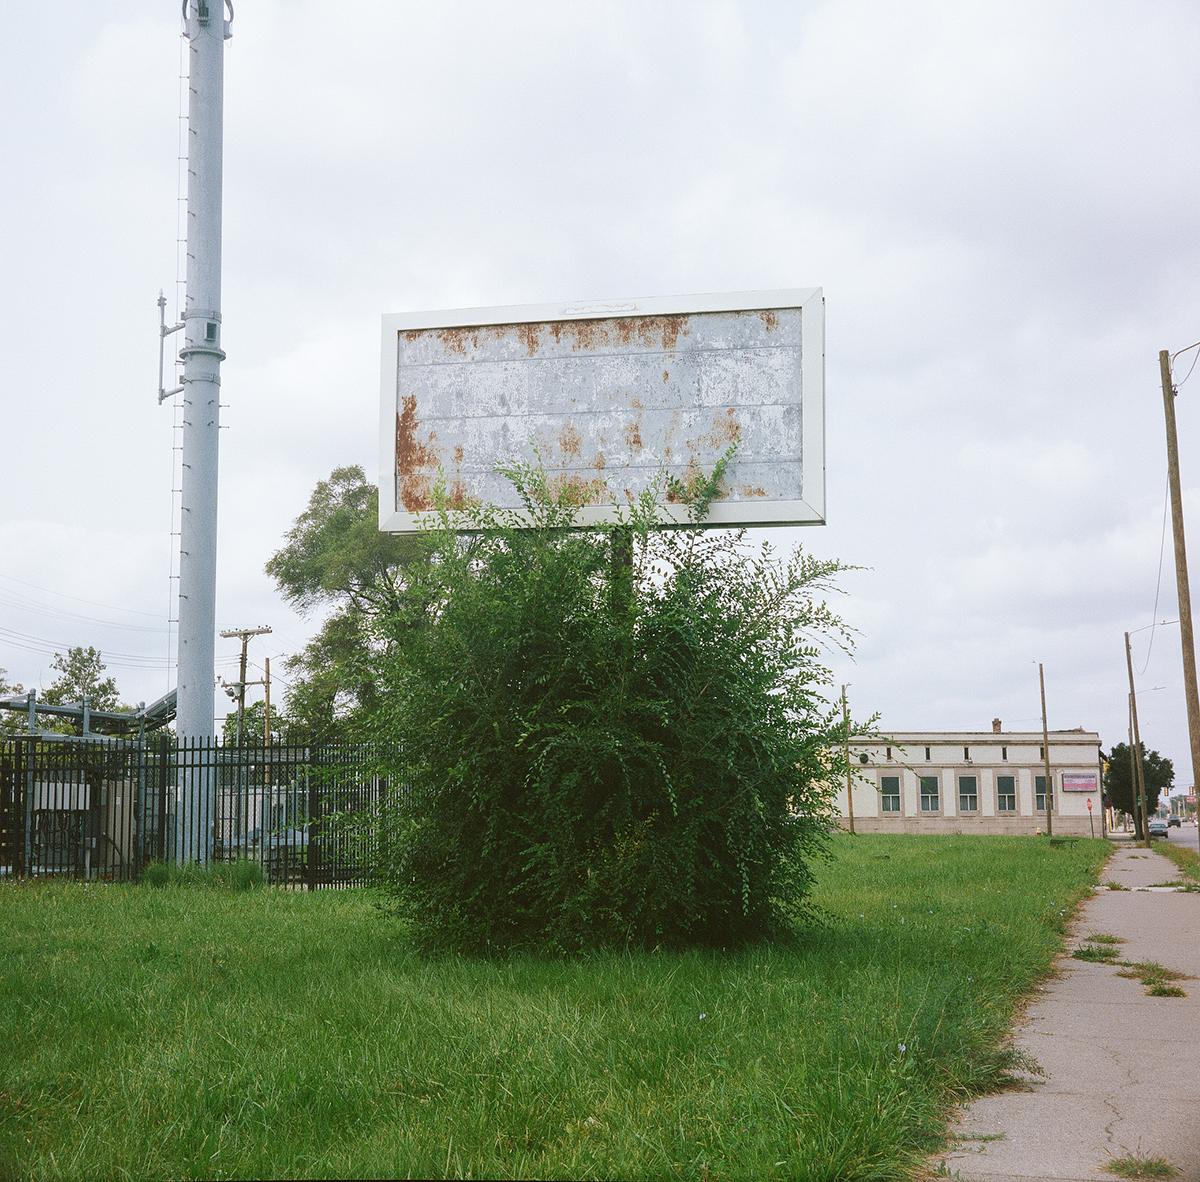 Gateway_Billboards-70.jpg